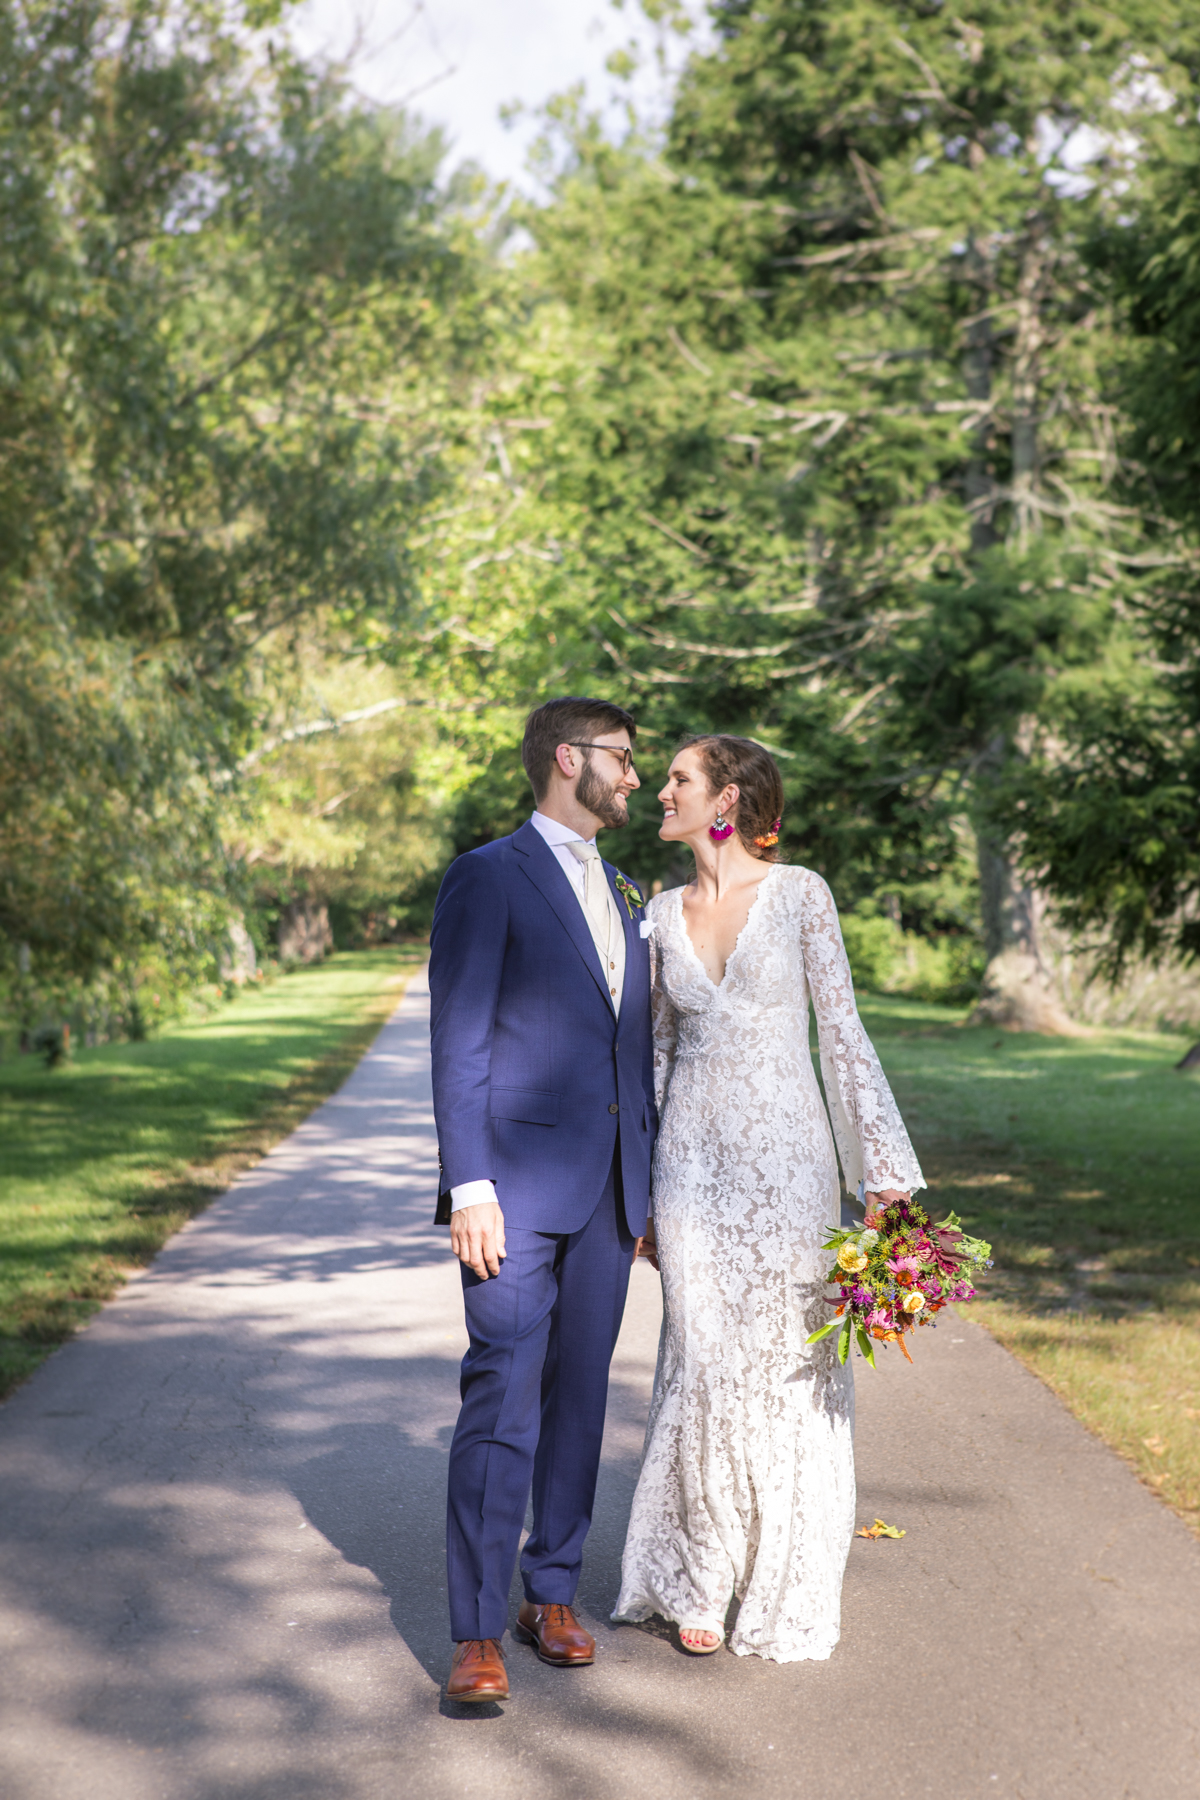 Aimee and Bryan Wedding Anniversary_photos by Studio Misha -4.jpg